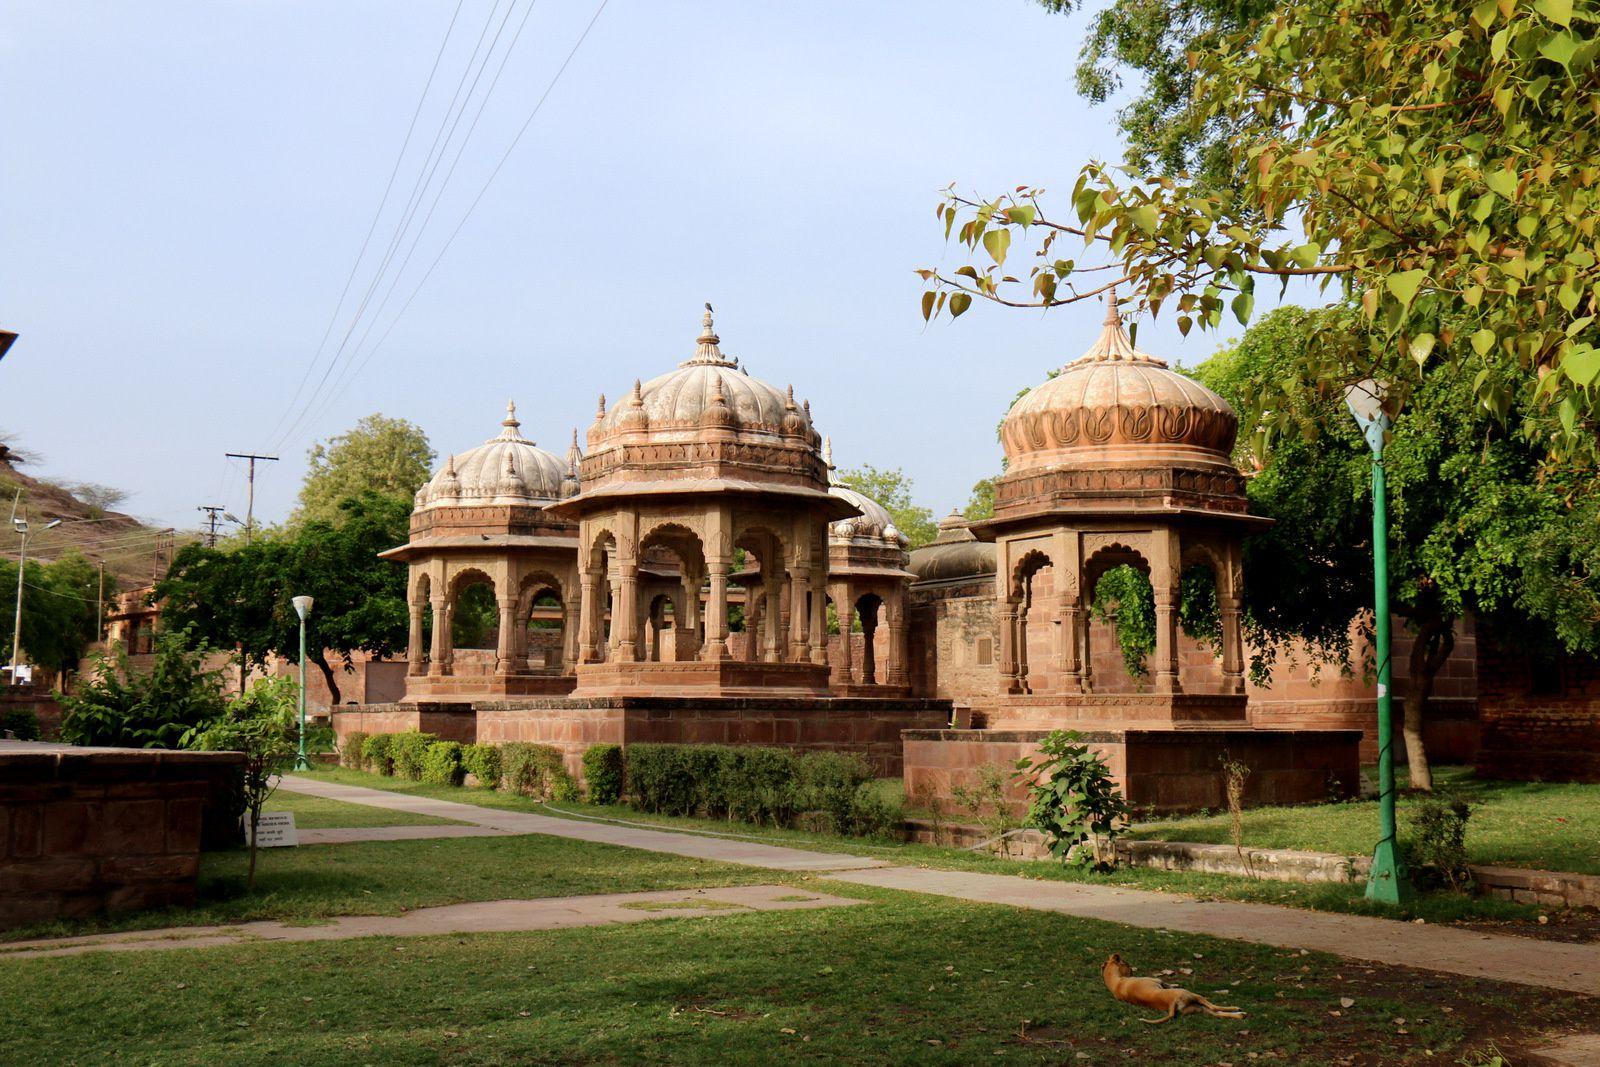 Cénotaphe du Maharaja Ajit Singh, Mandore (Etat indien du Rajasthan)